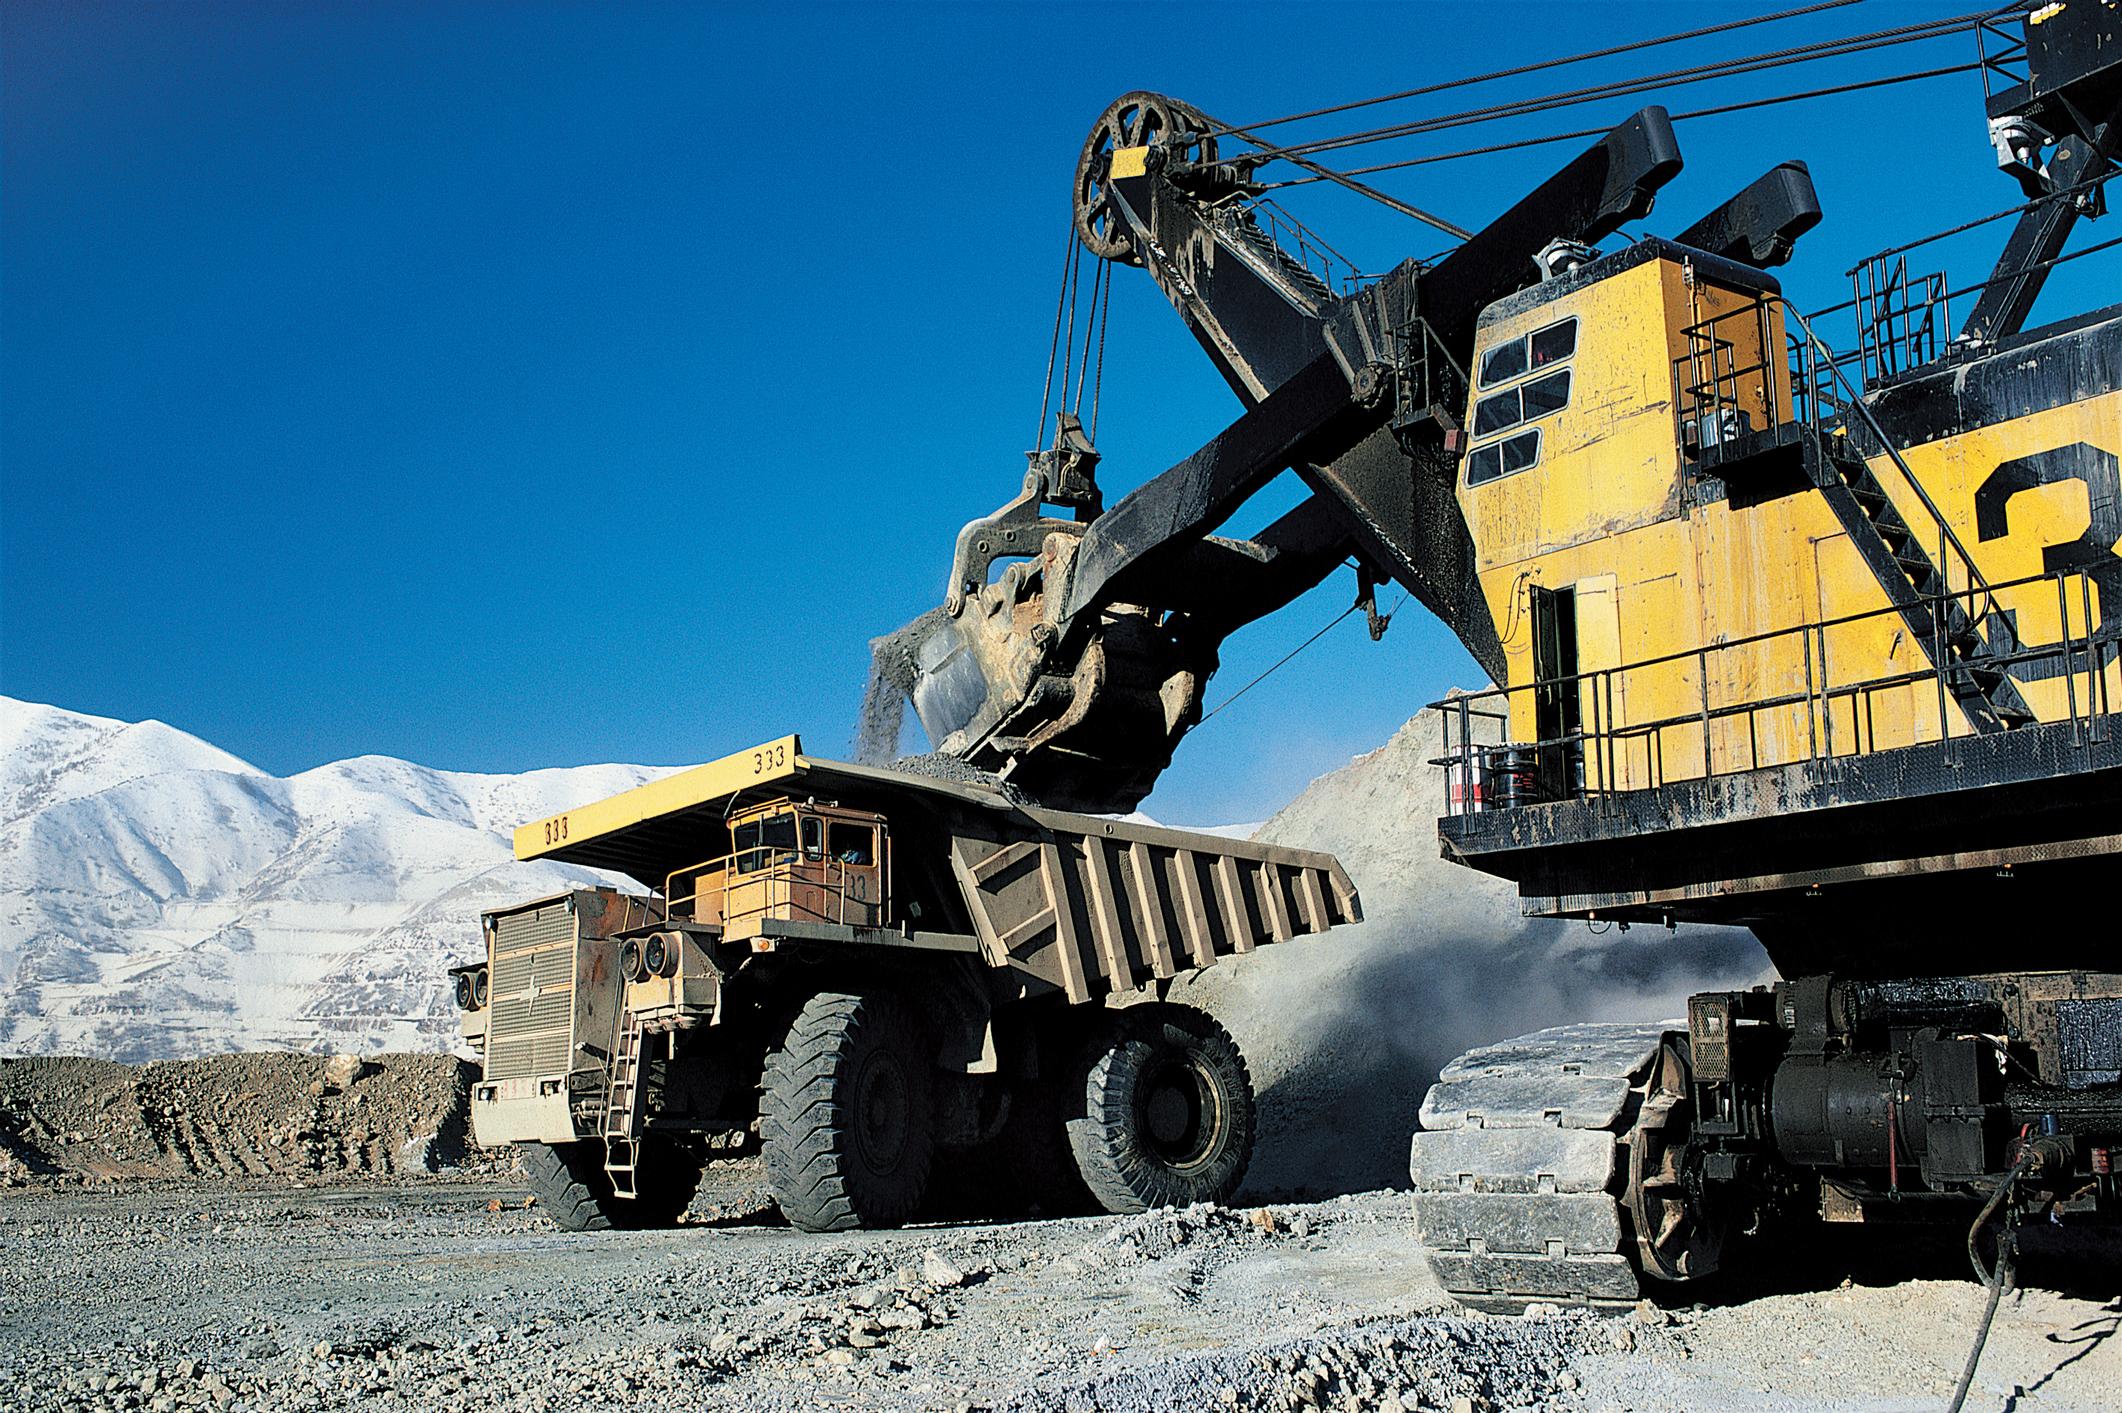 Excavator dumping material into a mining dump truck.